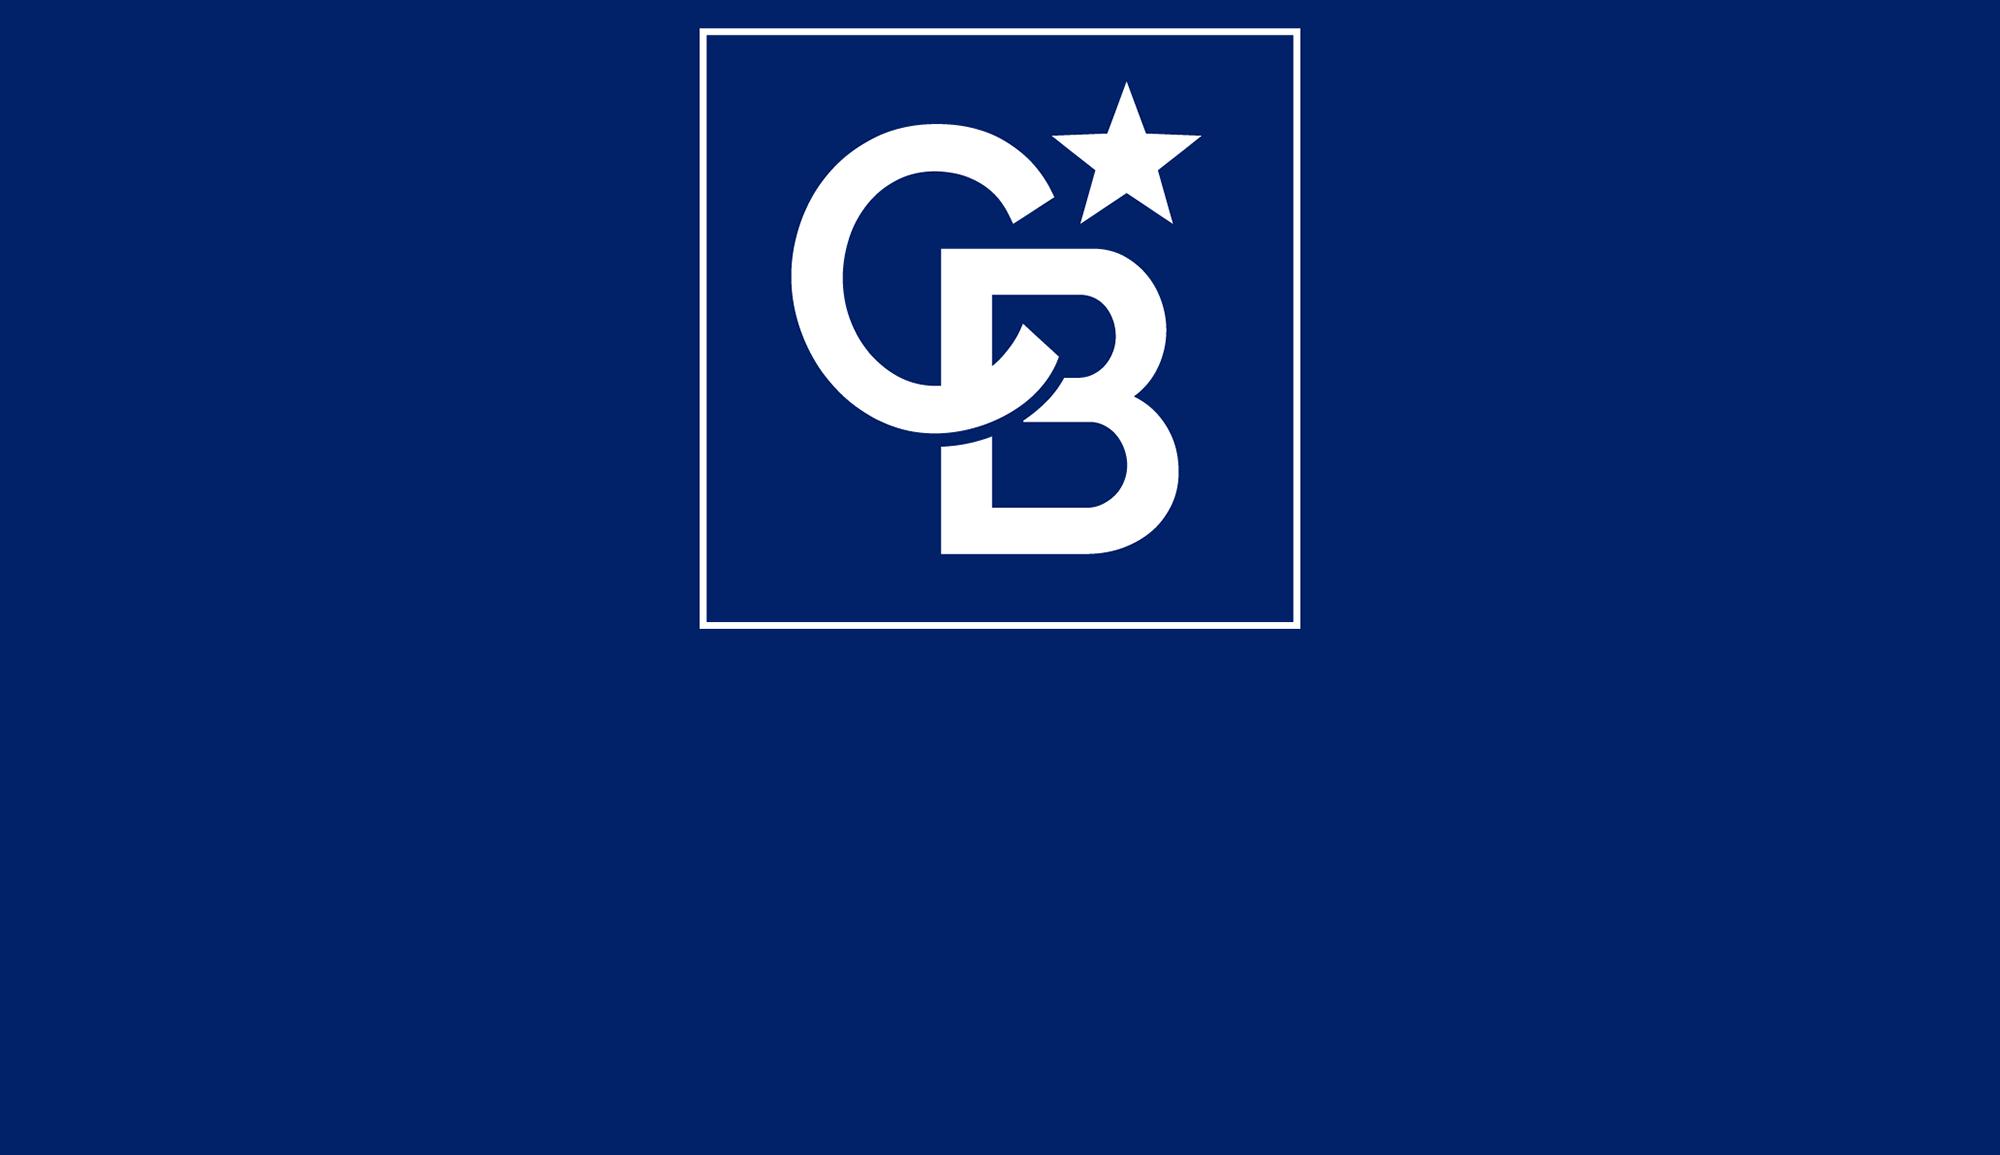 cbwm01 Logo